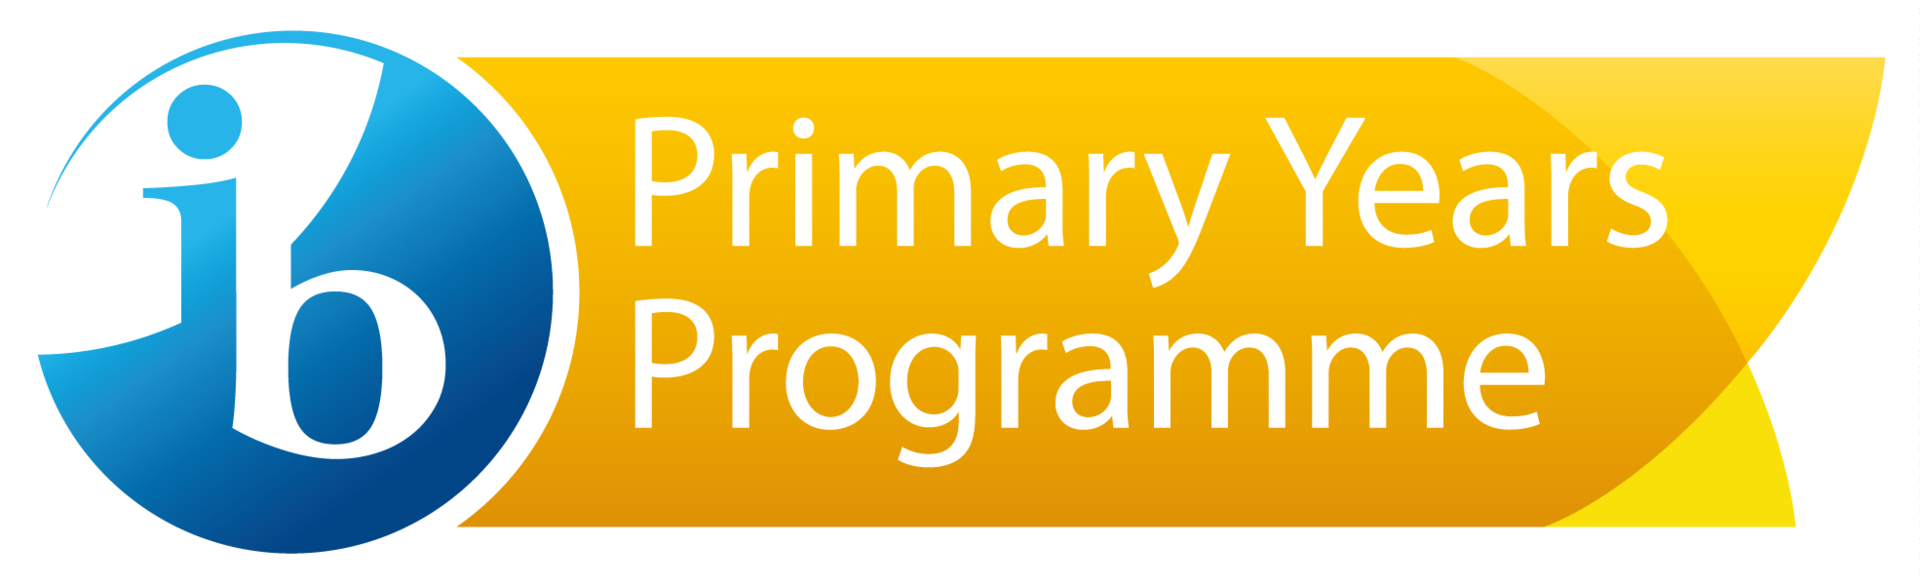 PYP Program Banner